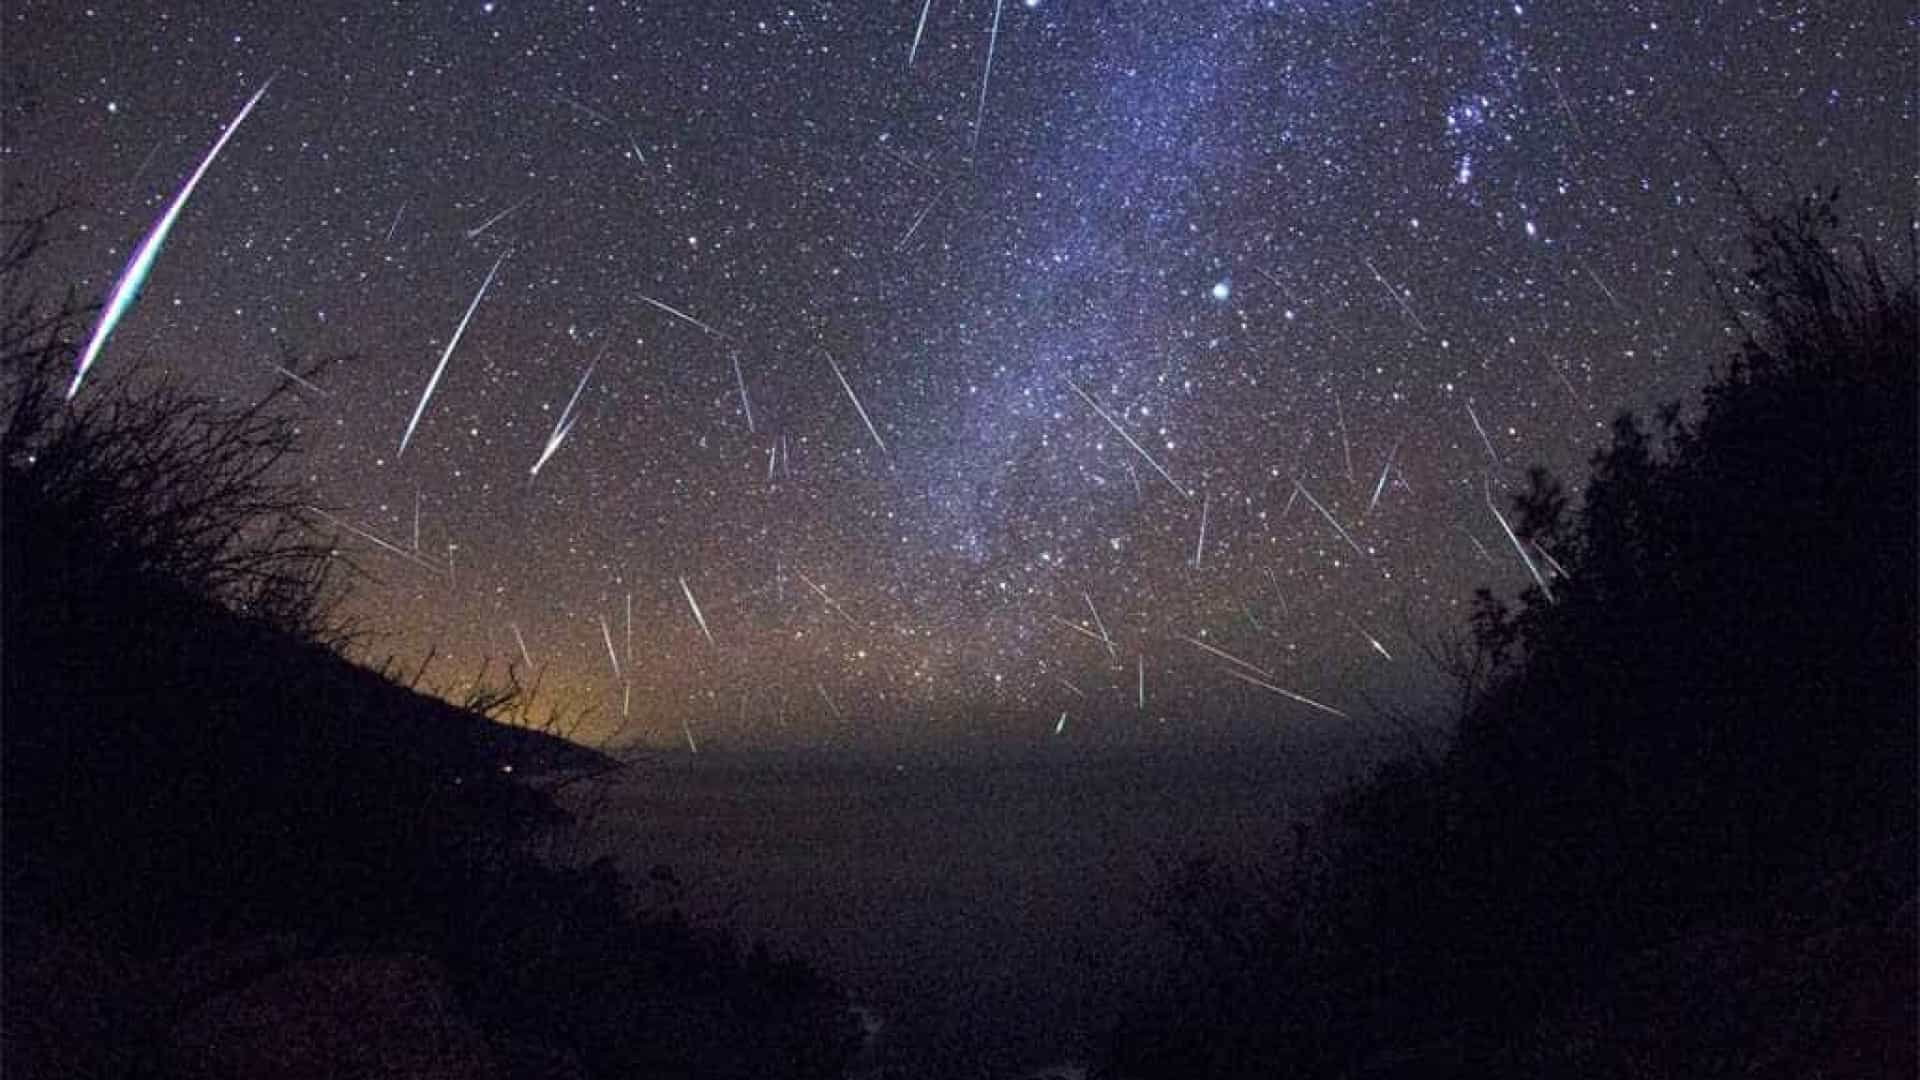 Cientistas encontram fonte de vida em meteoritos caídos na Terra